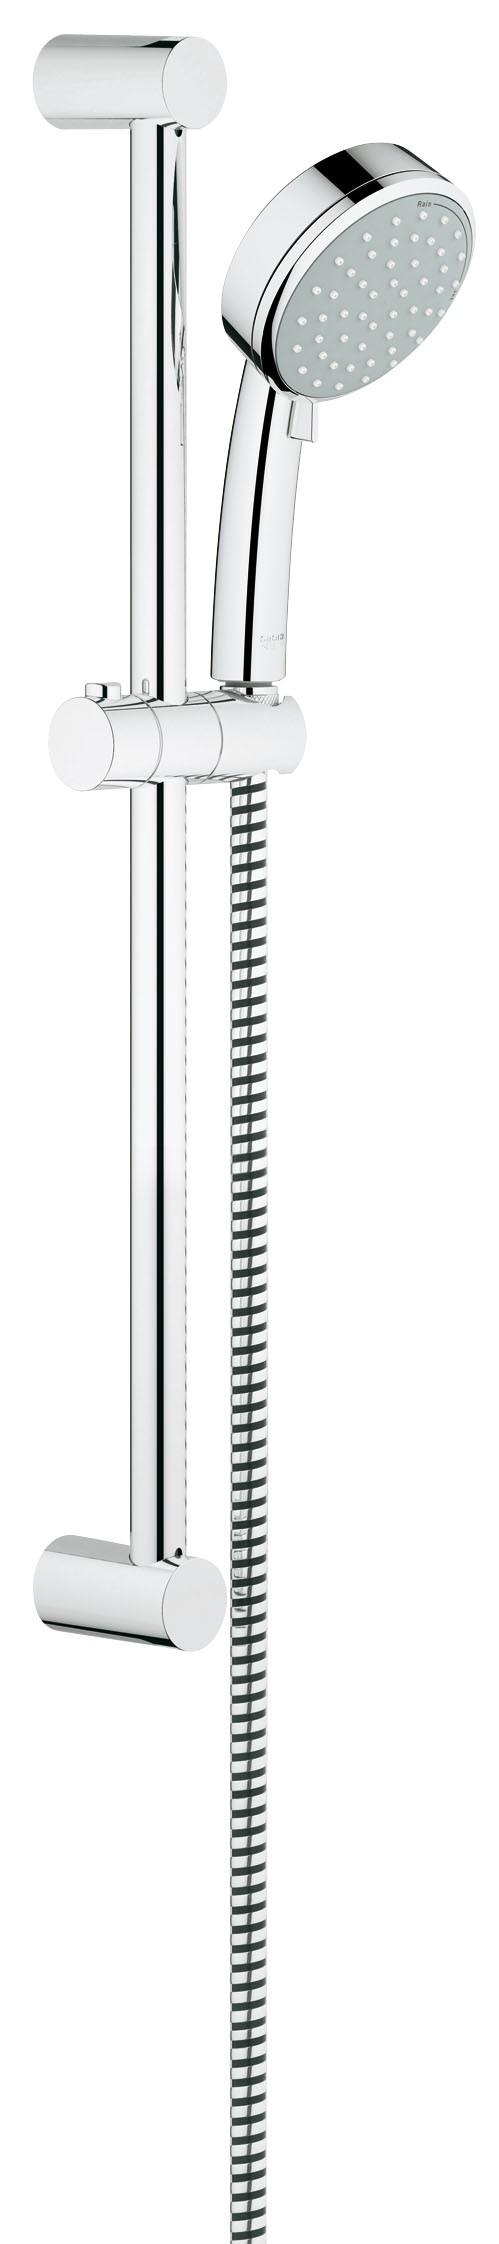 Grohe 2757810E Tempesta Cosmopolitan (ручной душ, штанга 600 мм, шланг 1750 мм), хром (2757810E)